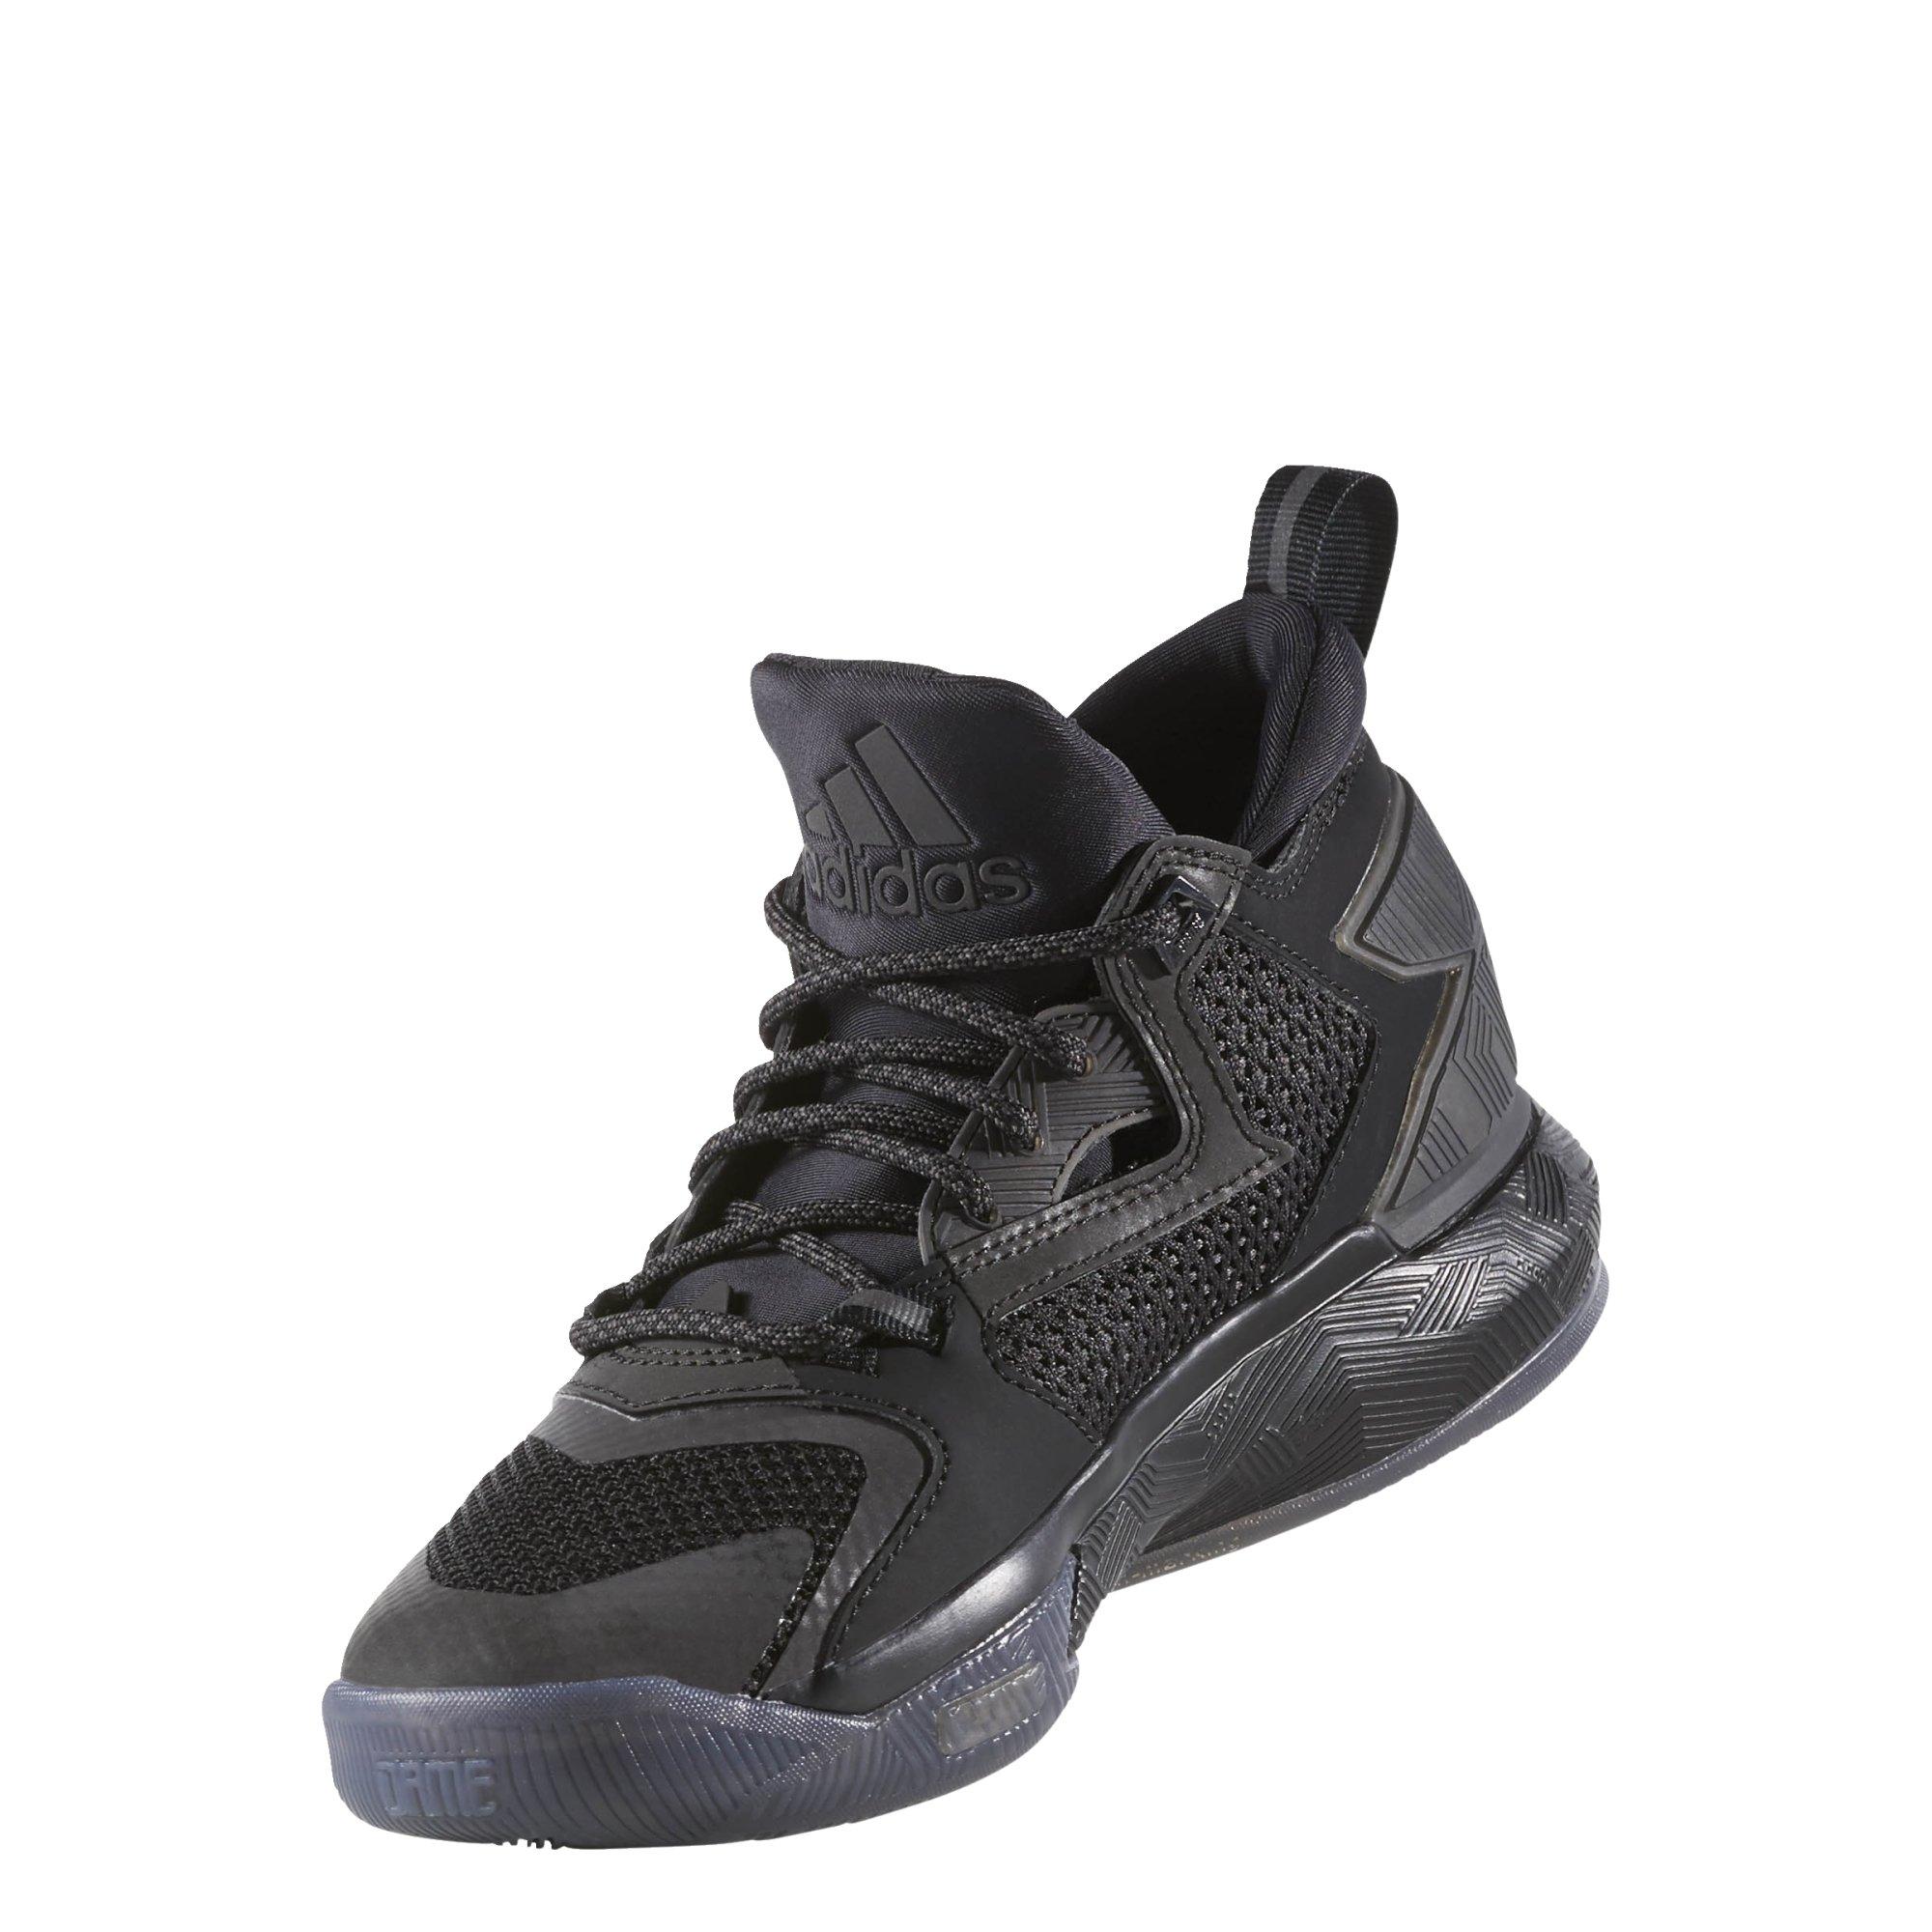 Adidas D Lillard 2 J boys basketball-shoes B39073_5 - CBLACK,CBLACK,CBLACK